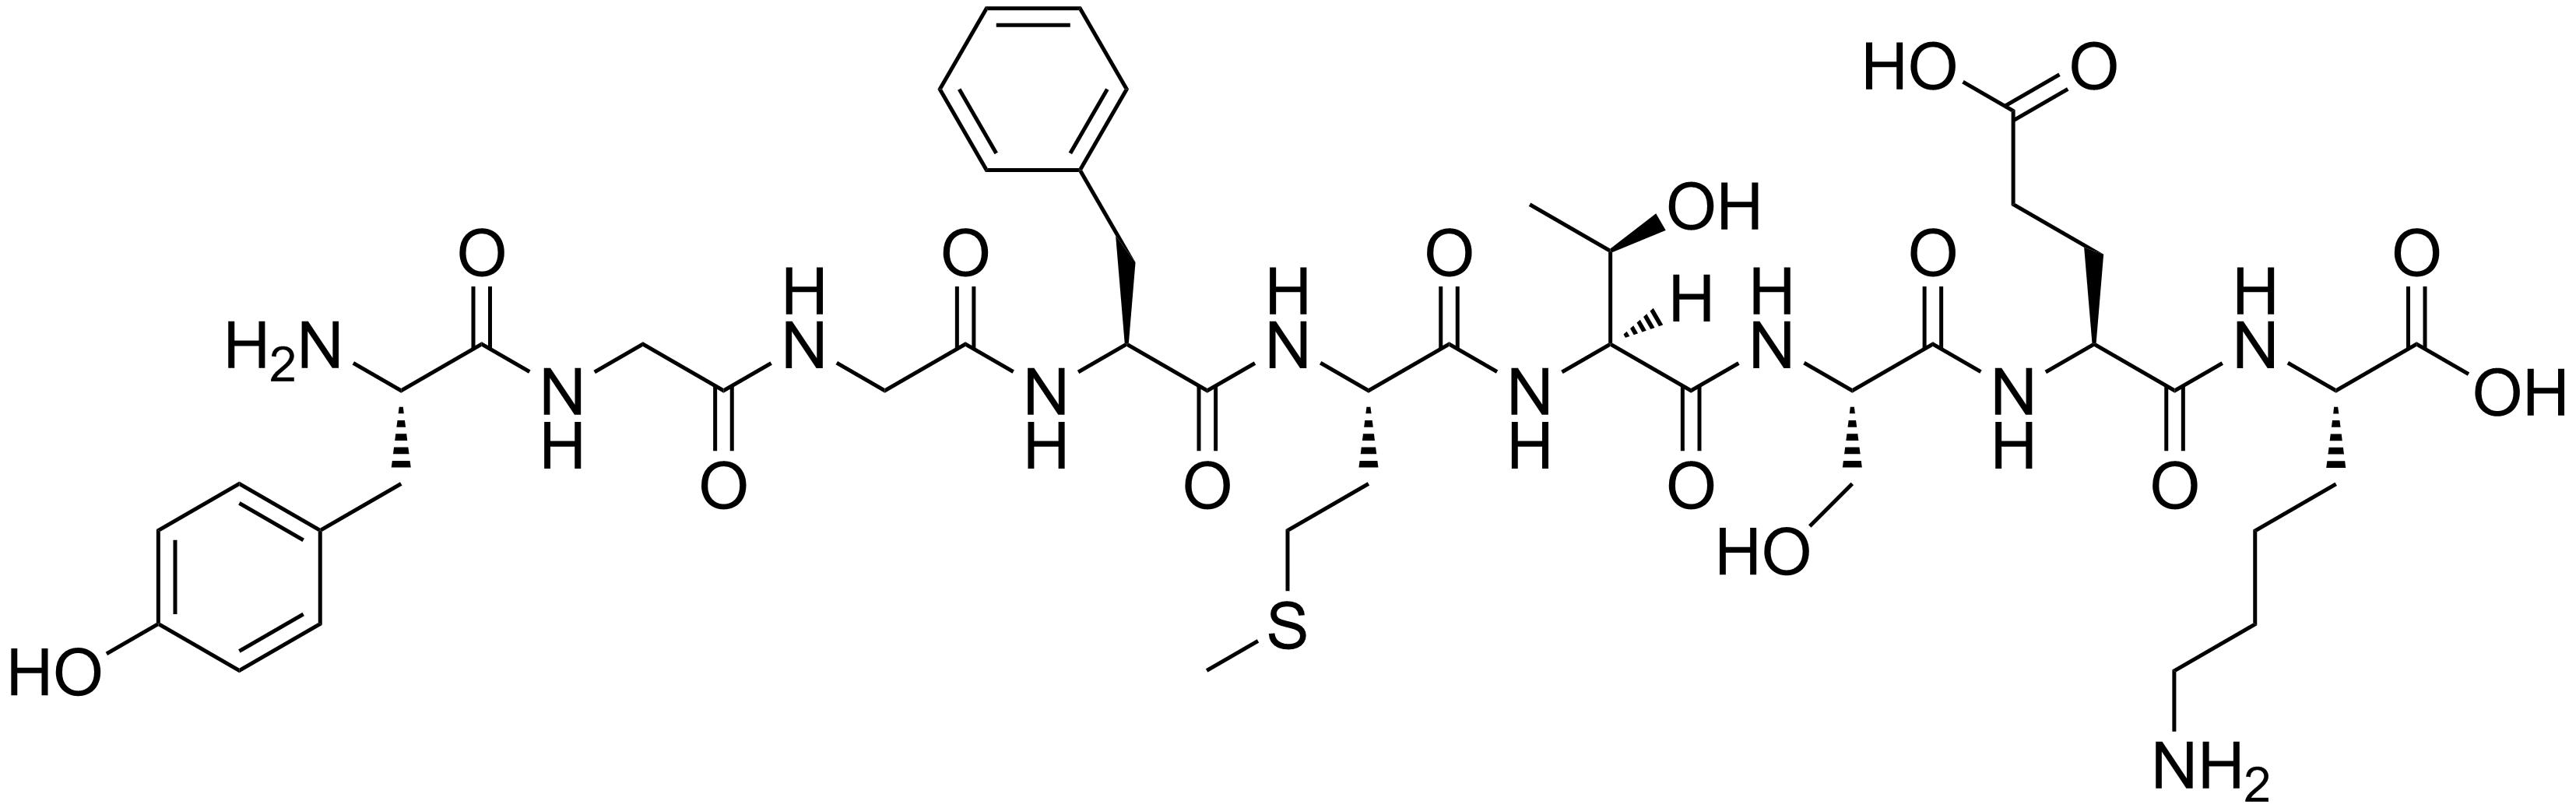 Image Result For Basic